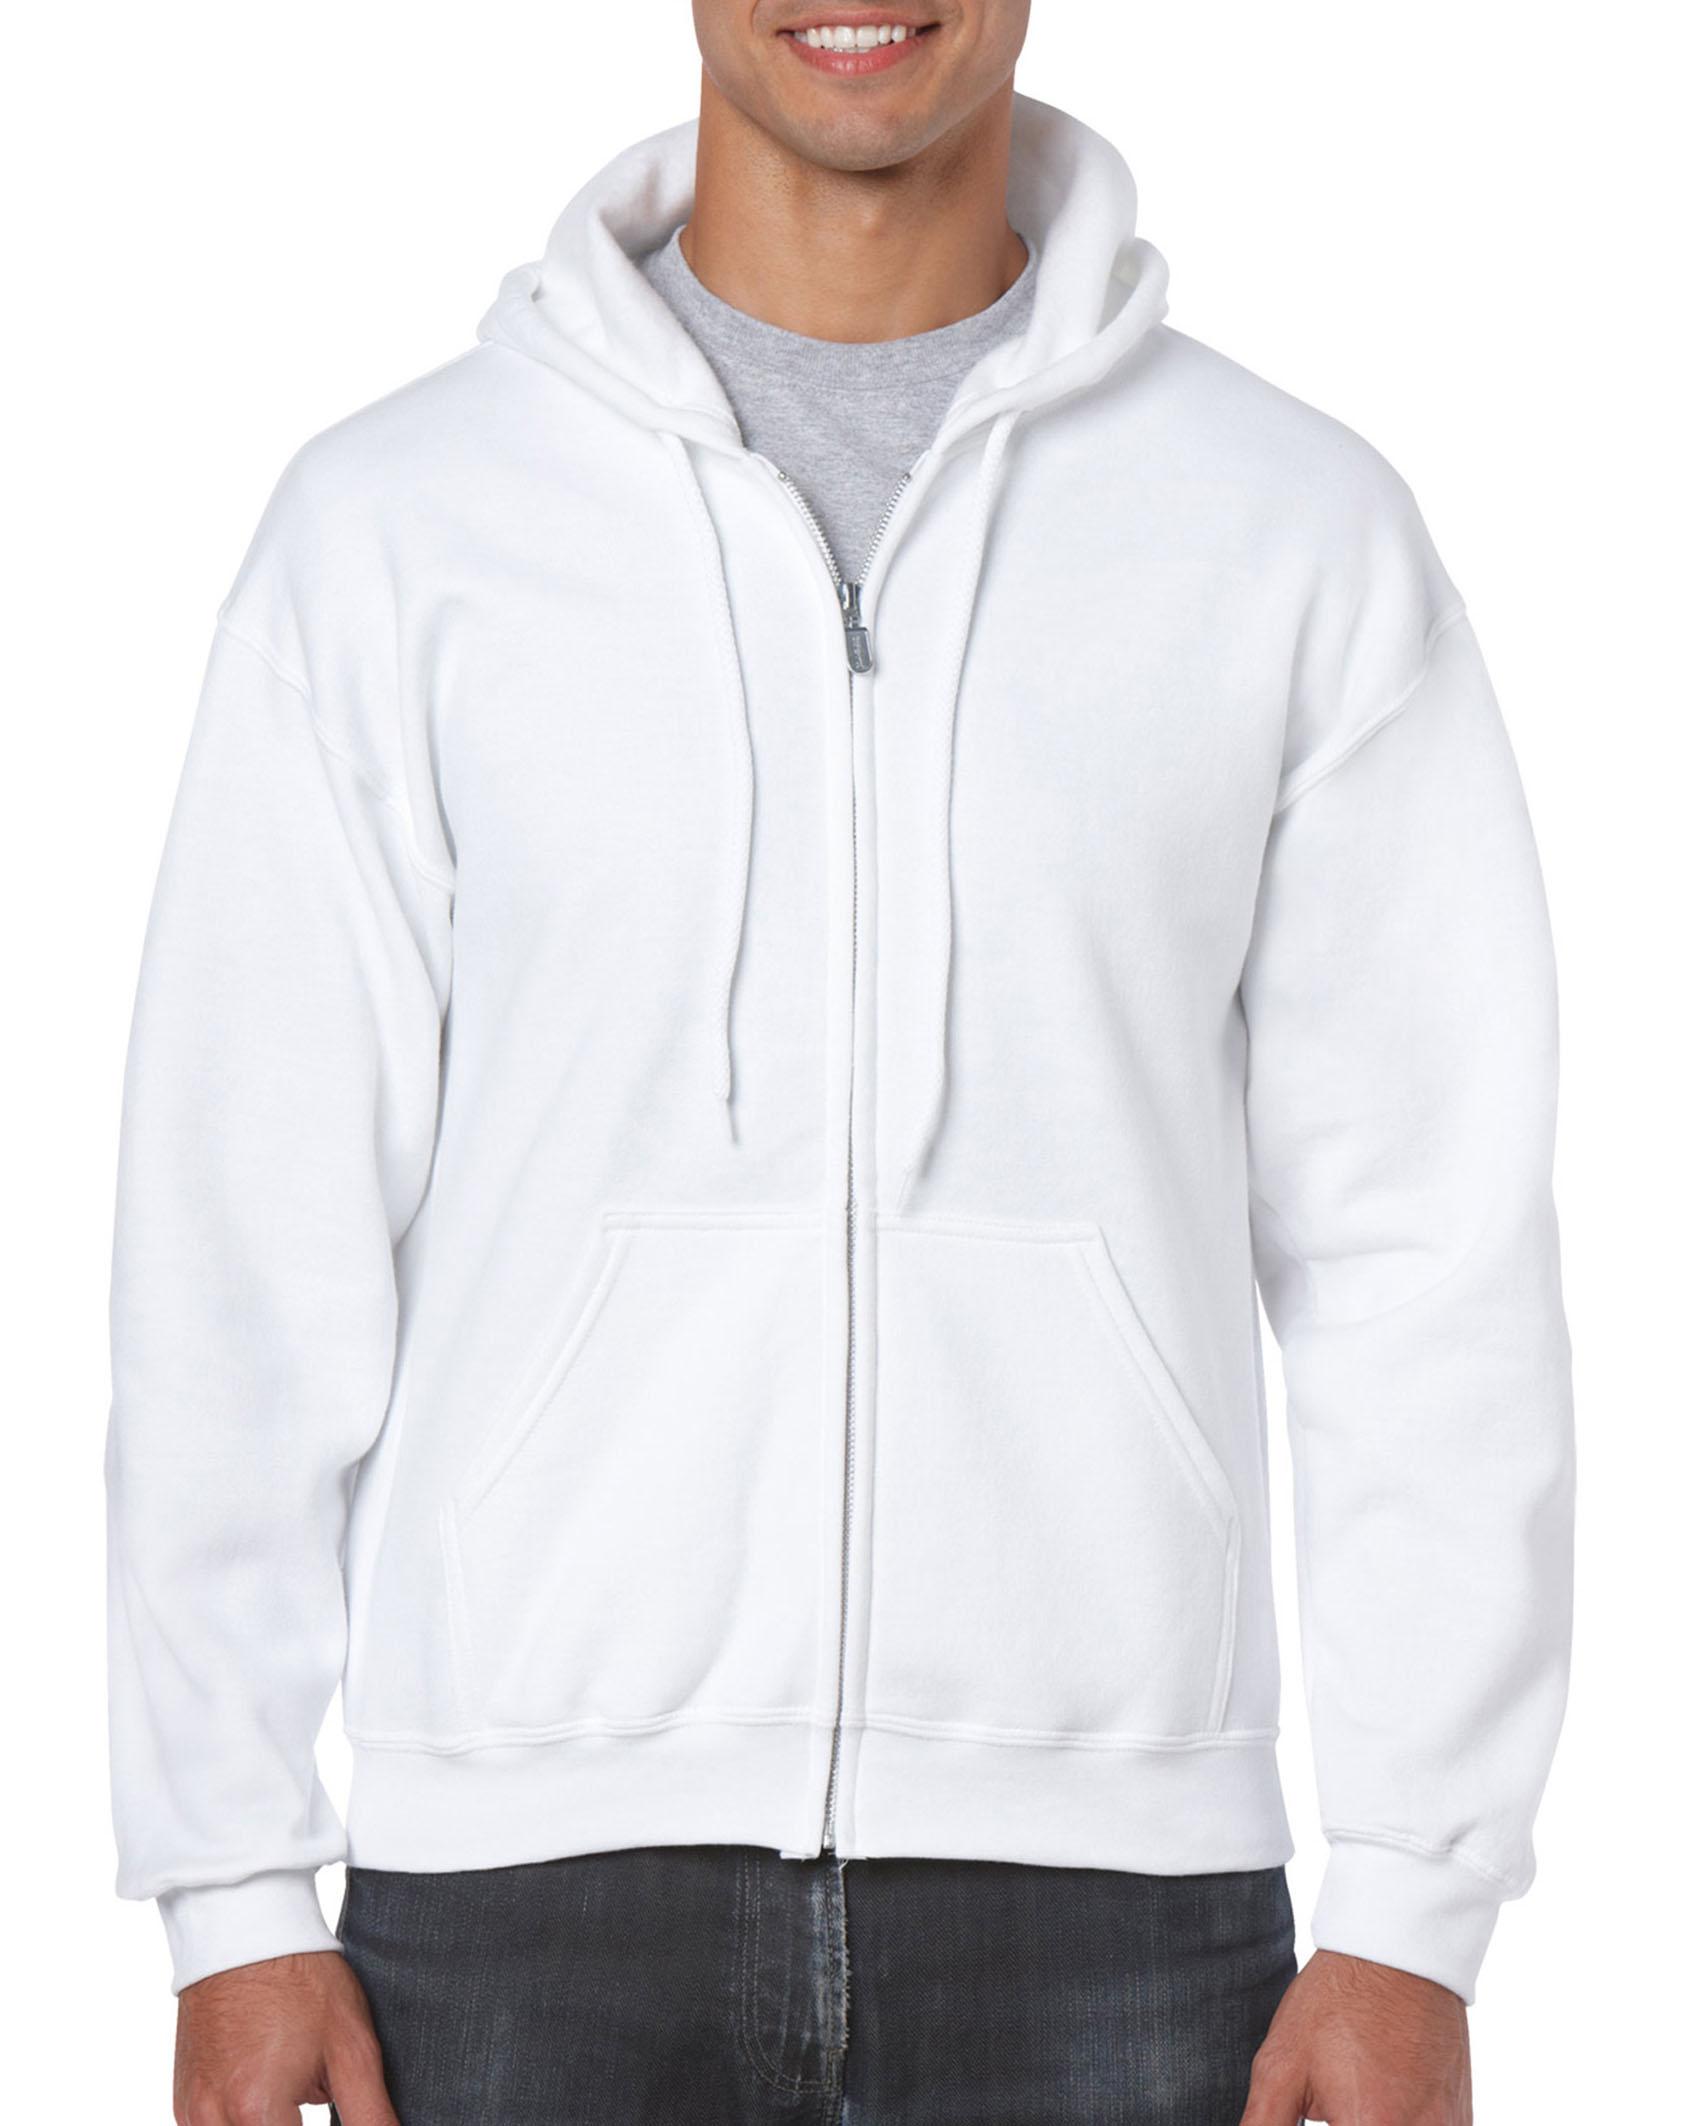 25St Gildan Hoodie Full Zip incl. 1k opdruk (White)